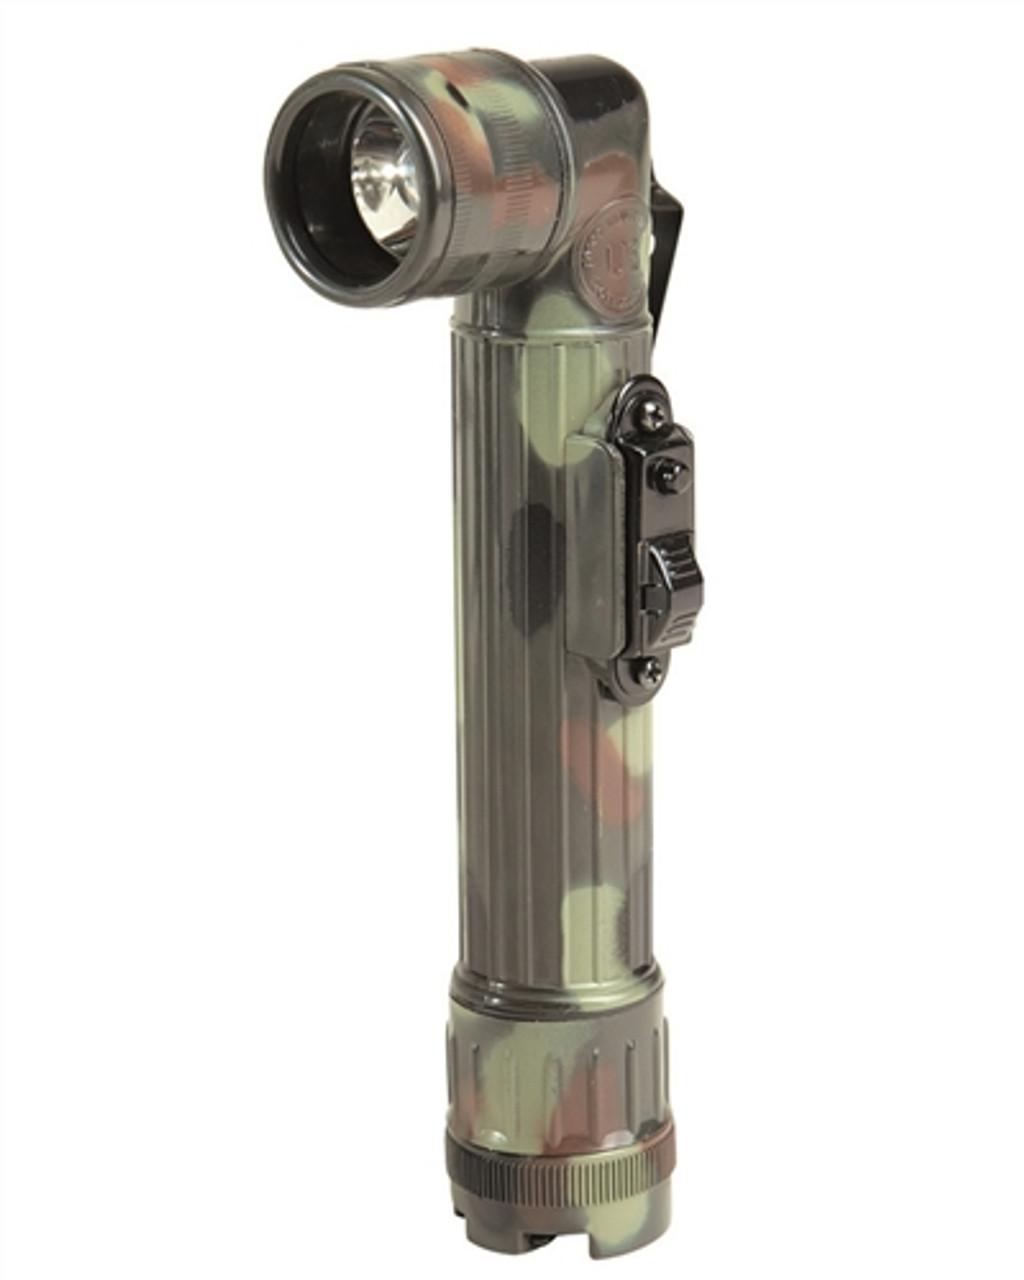 Flecktarn Camo Medium LED Angle Head Flash Light